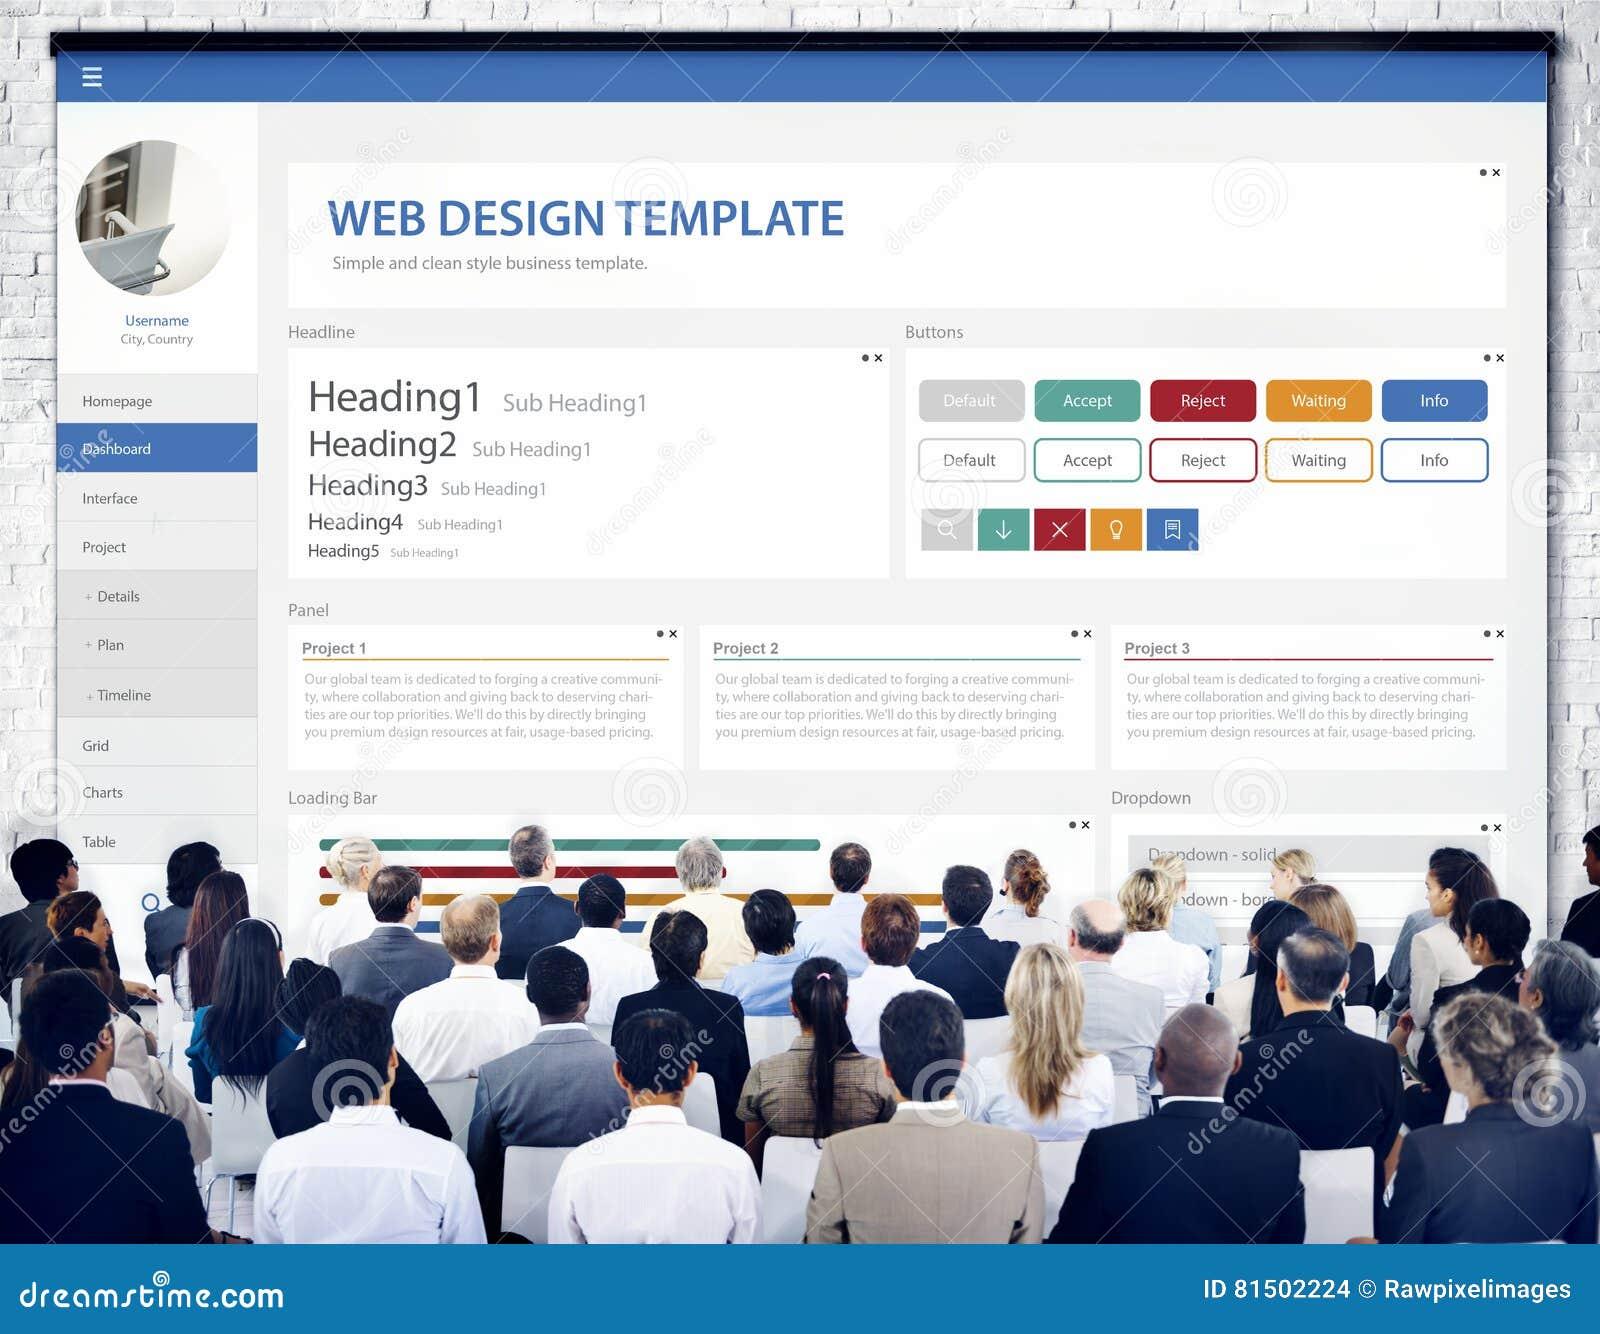 Творческая концепция шаблона дизайна вебсайта образца